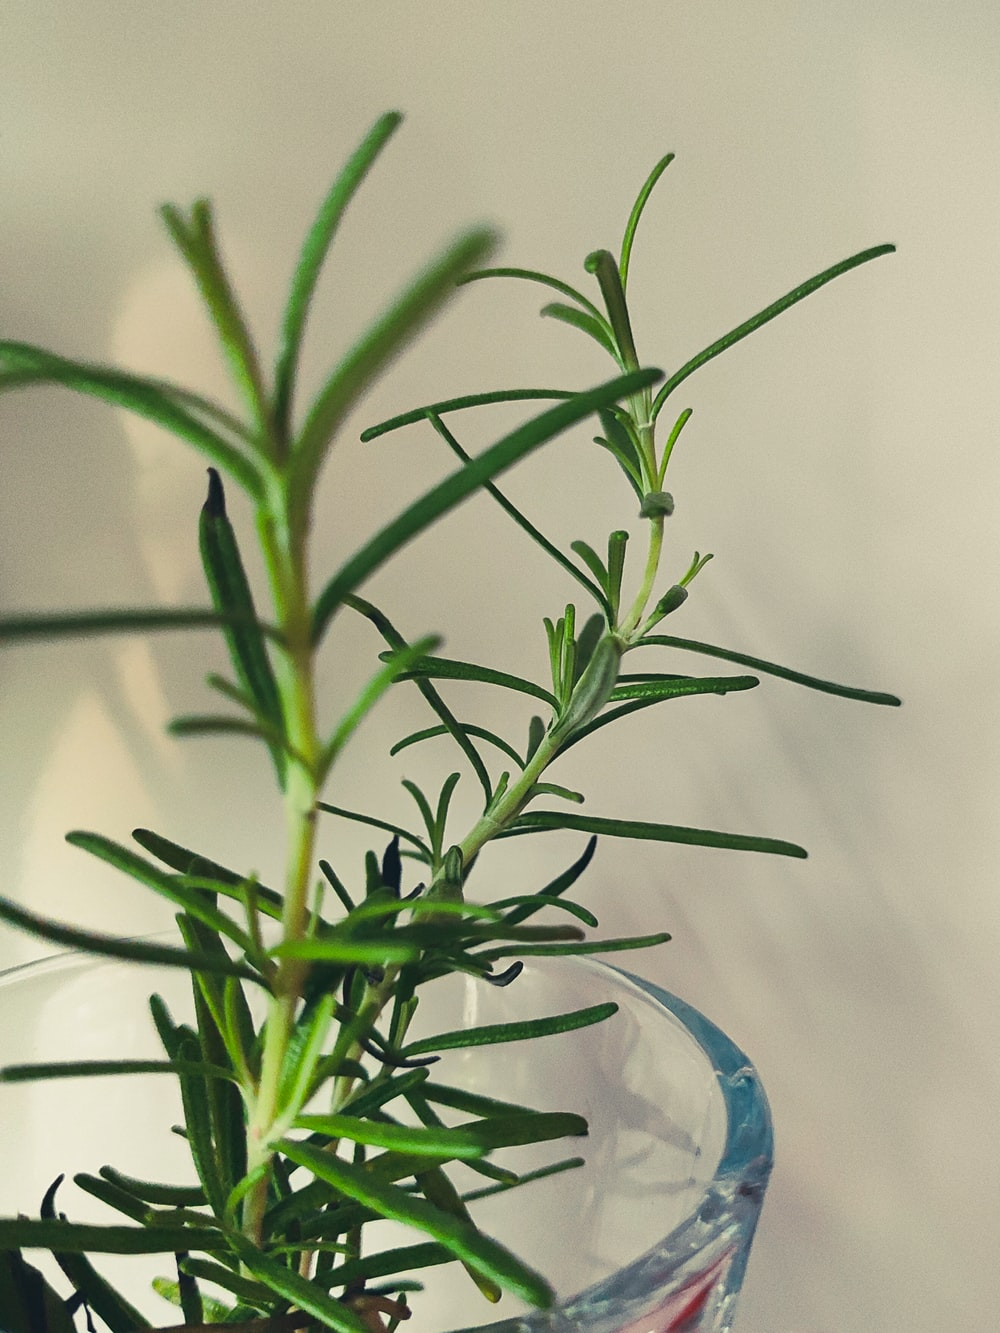 green plant on blue glass vase